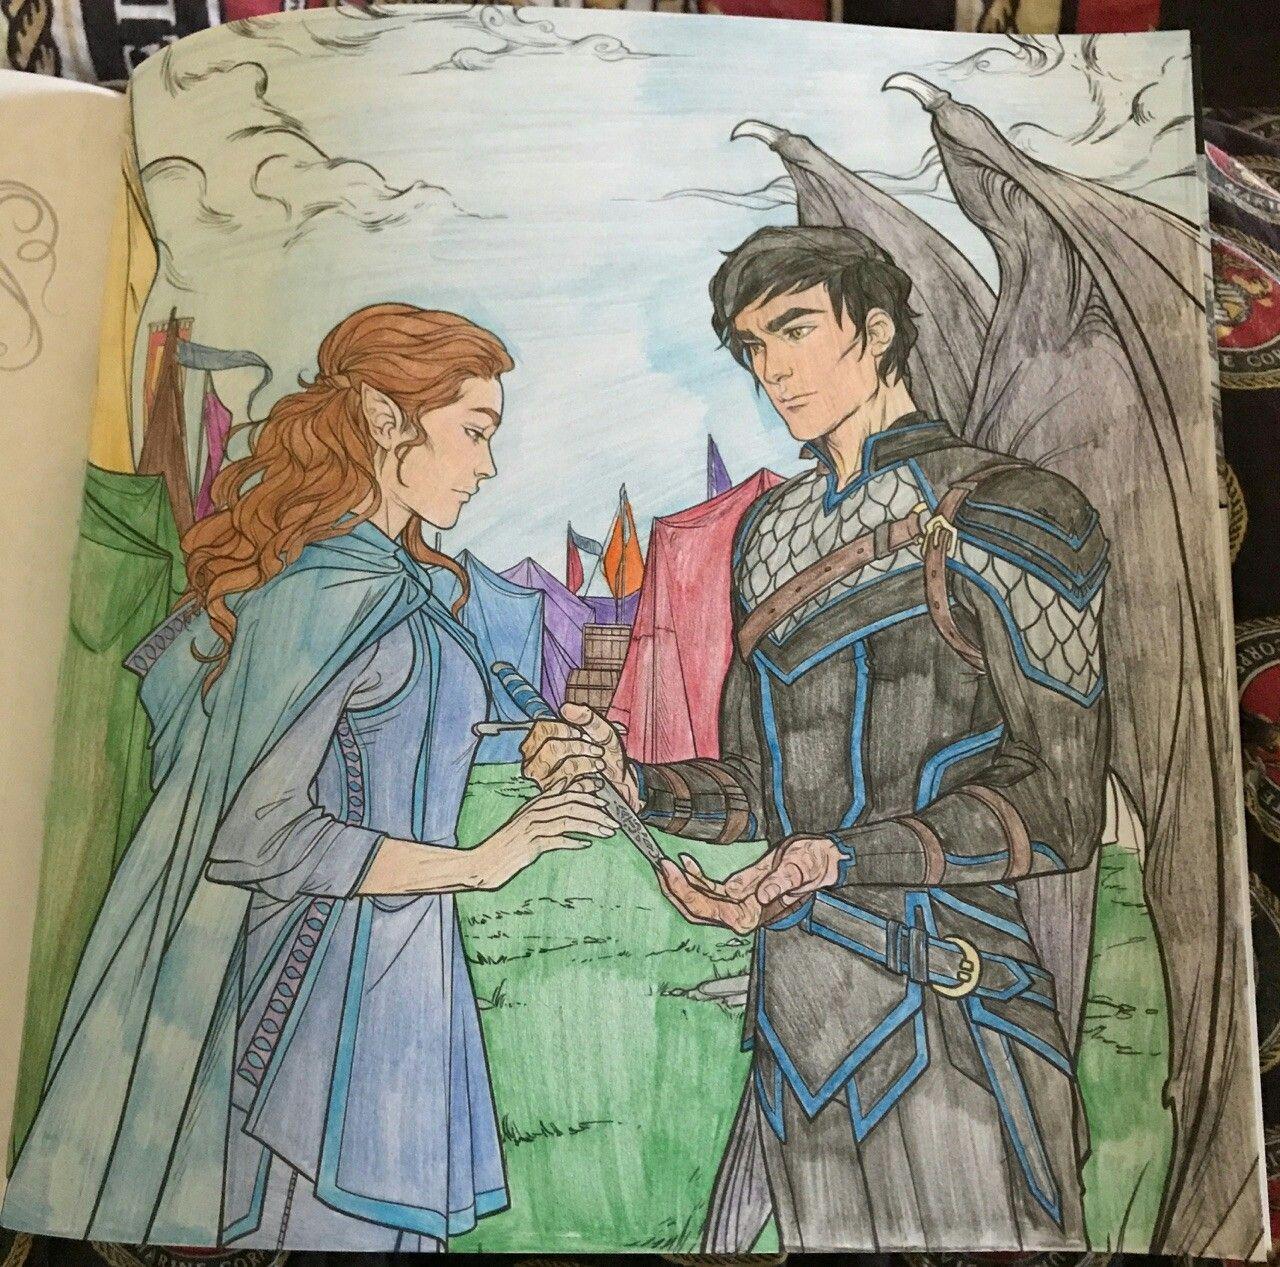 Elain Azriel Acotar Coloring Book Coloring Book Art A Court Of Mist And Fury Coloring Books